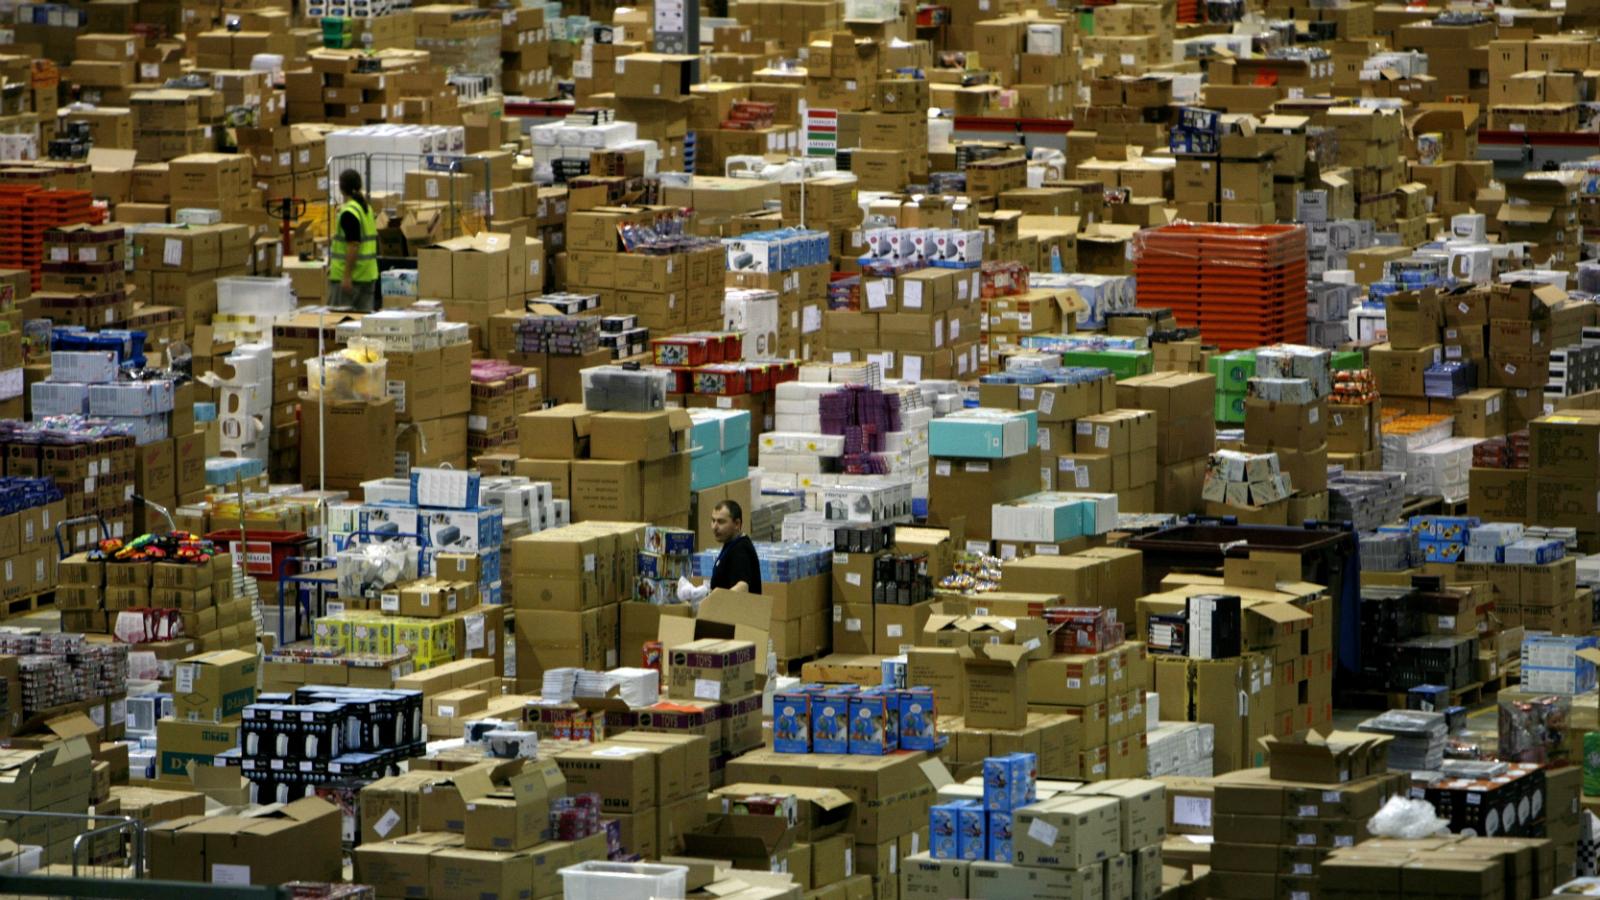 GST-Warehouse-Logistics-Robots